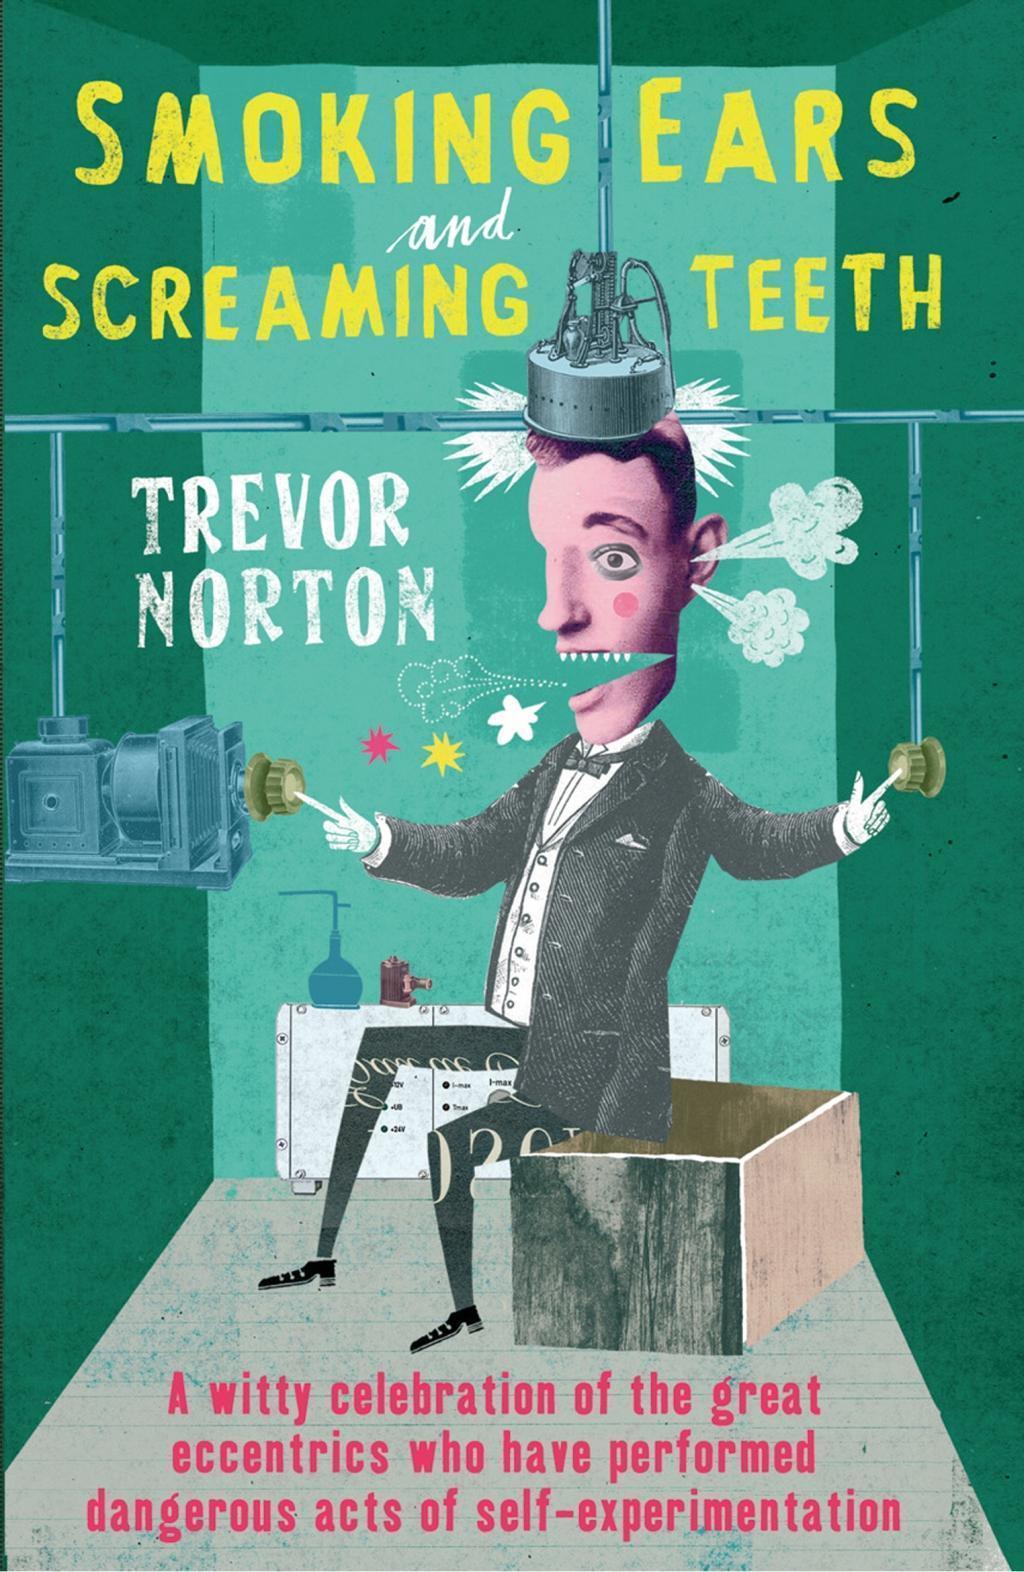 Smoking Ears and Screaming Teeth